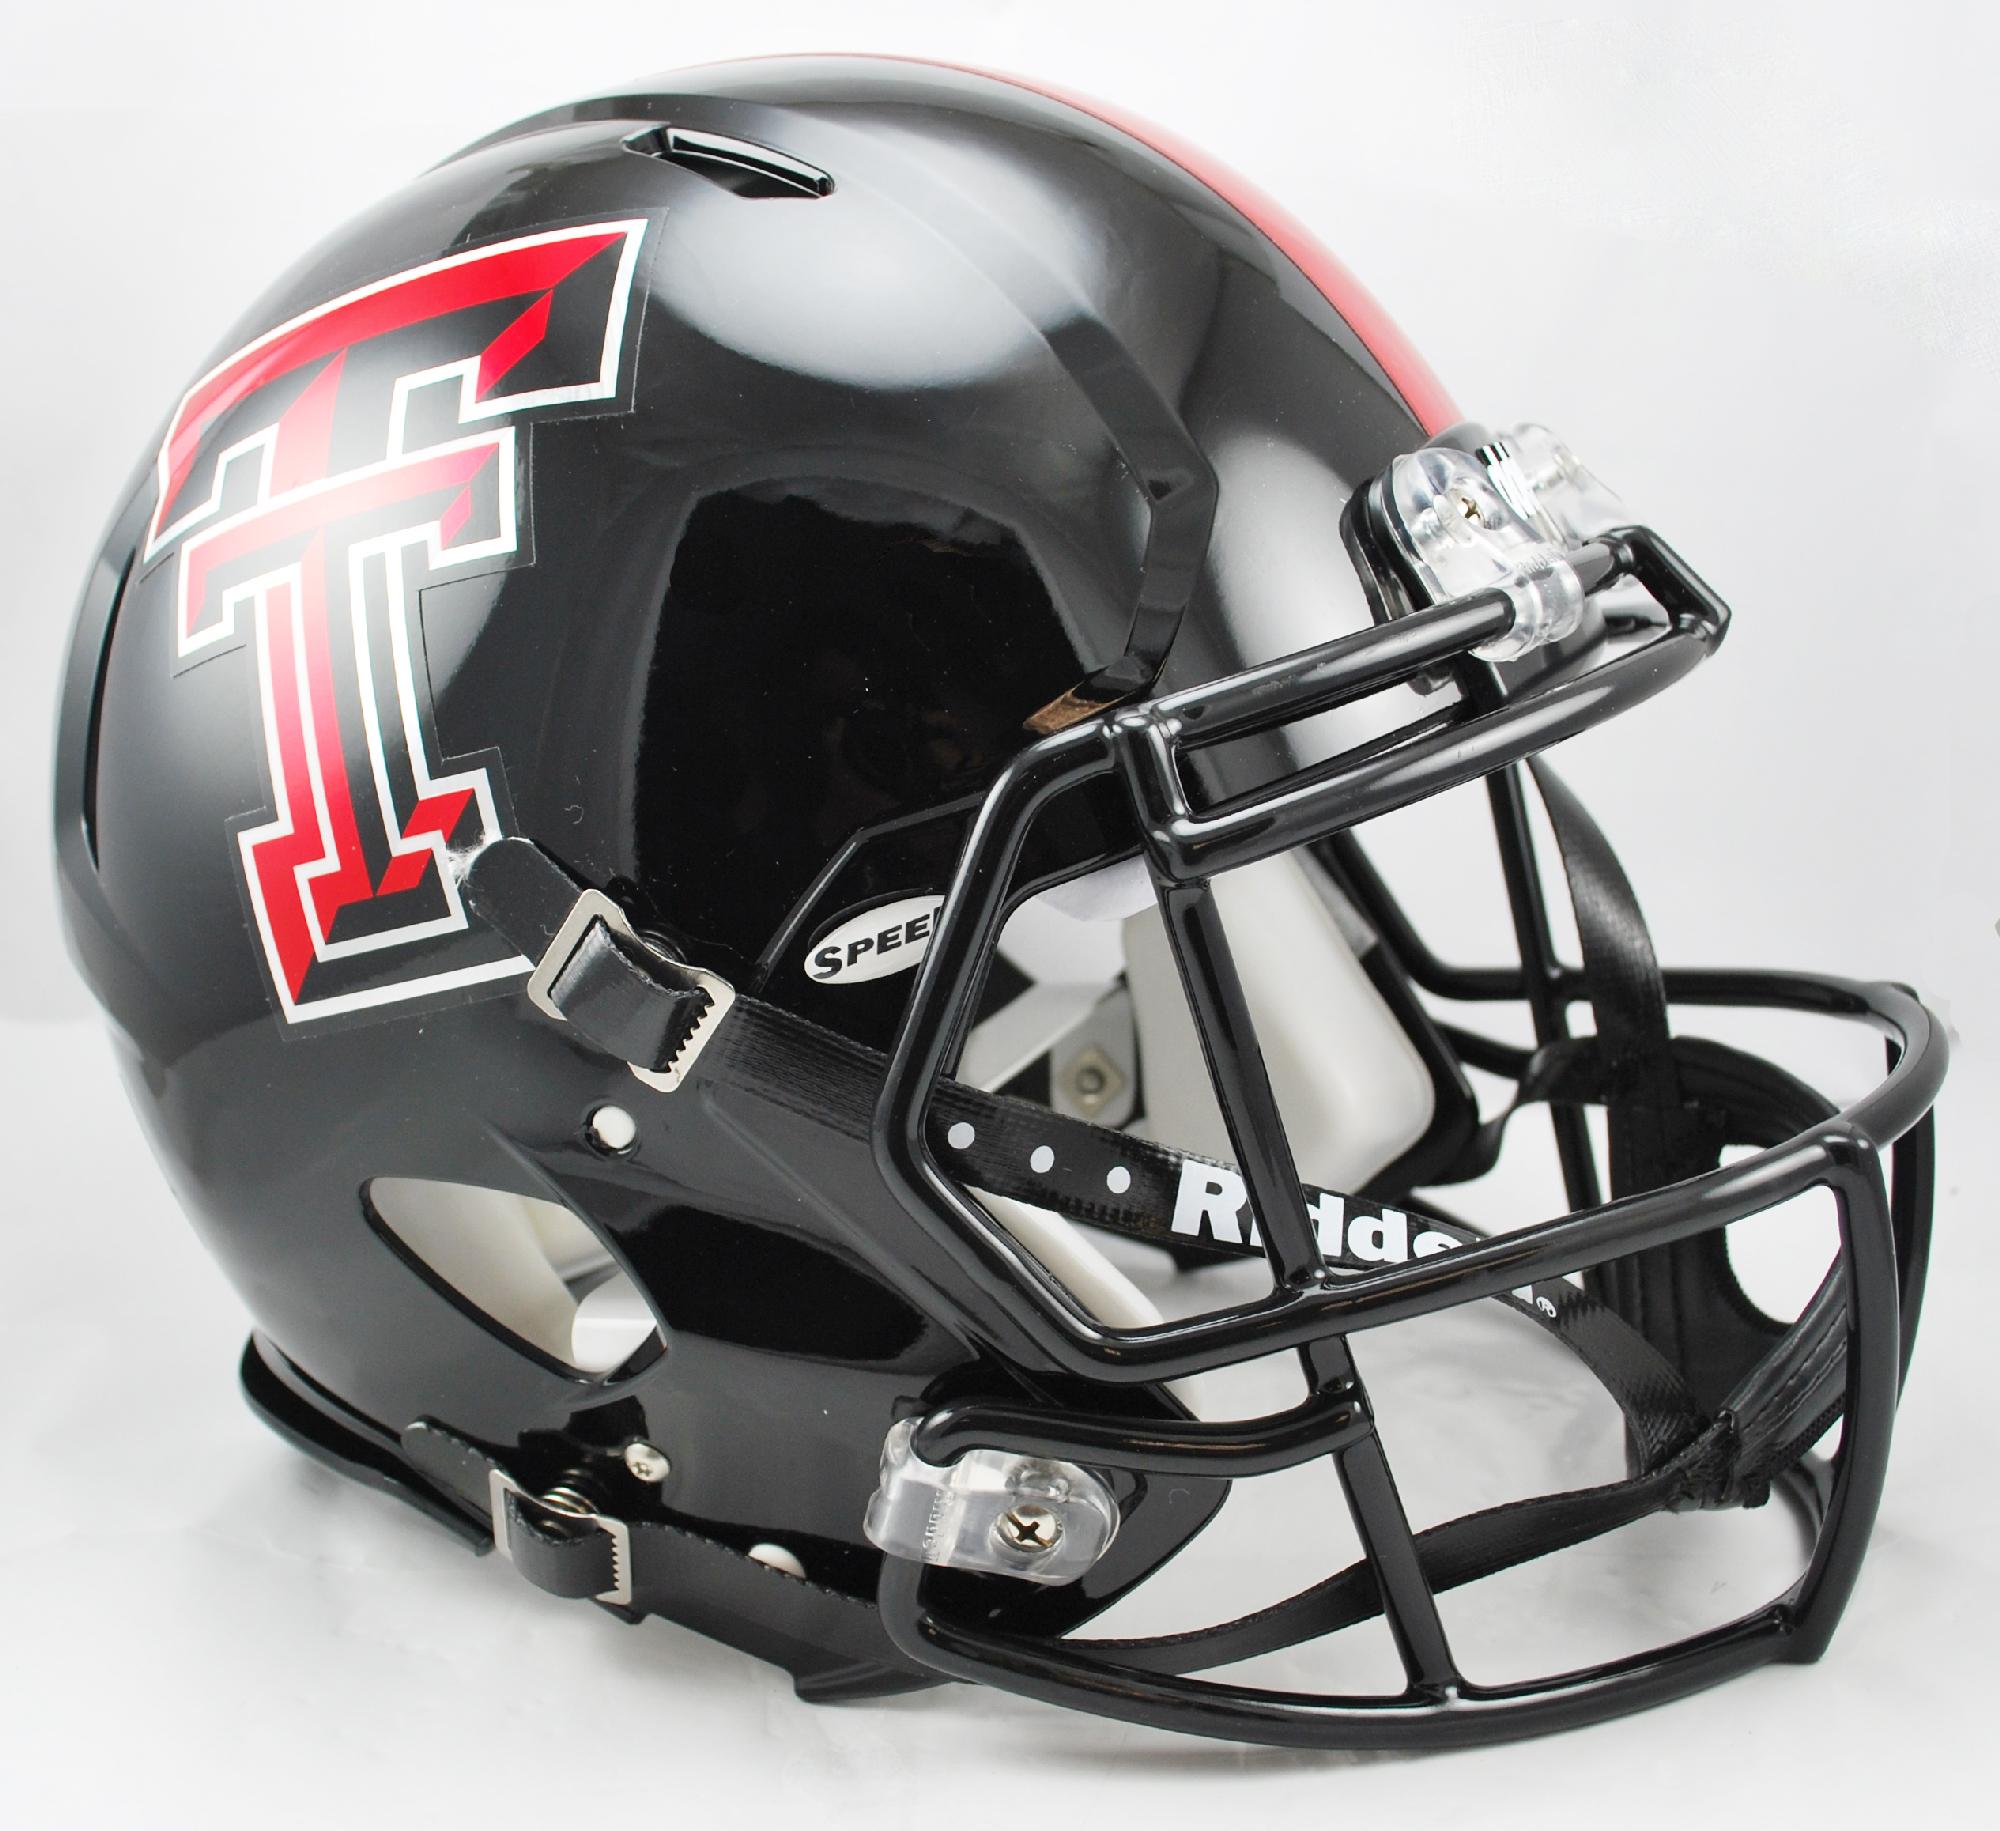 Texas Tech Red Raiders Speed Football Helmet <B>Chrome Decal</B>